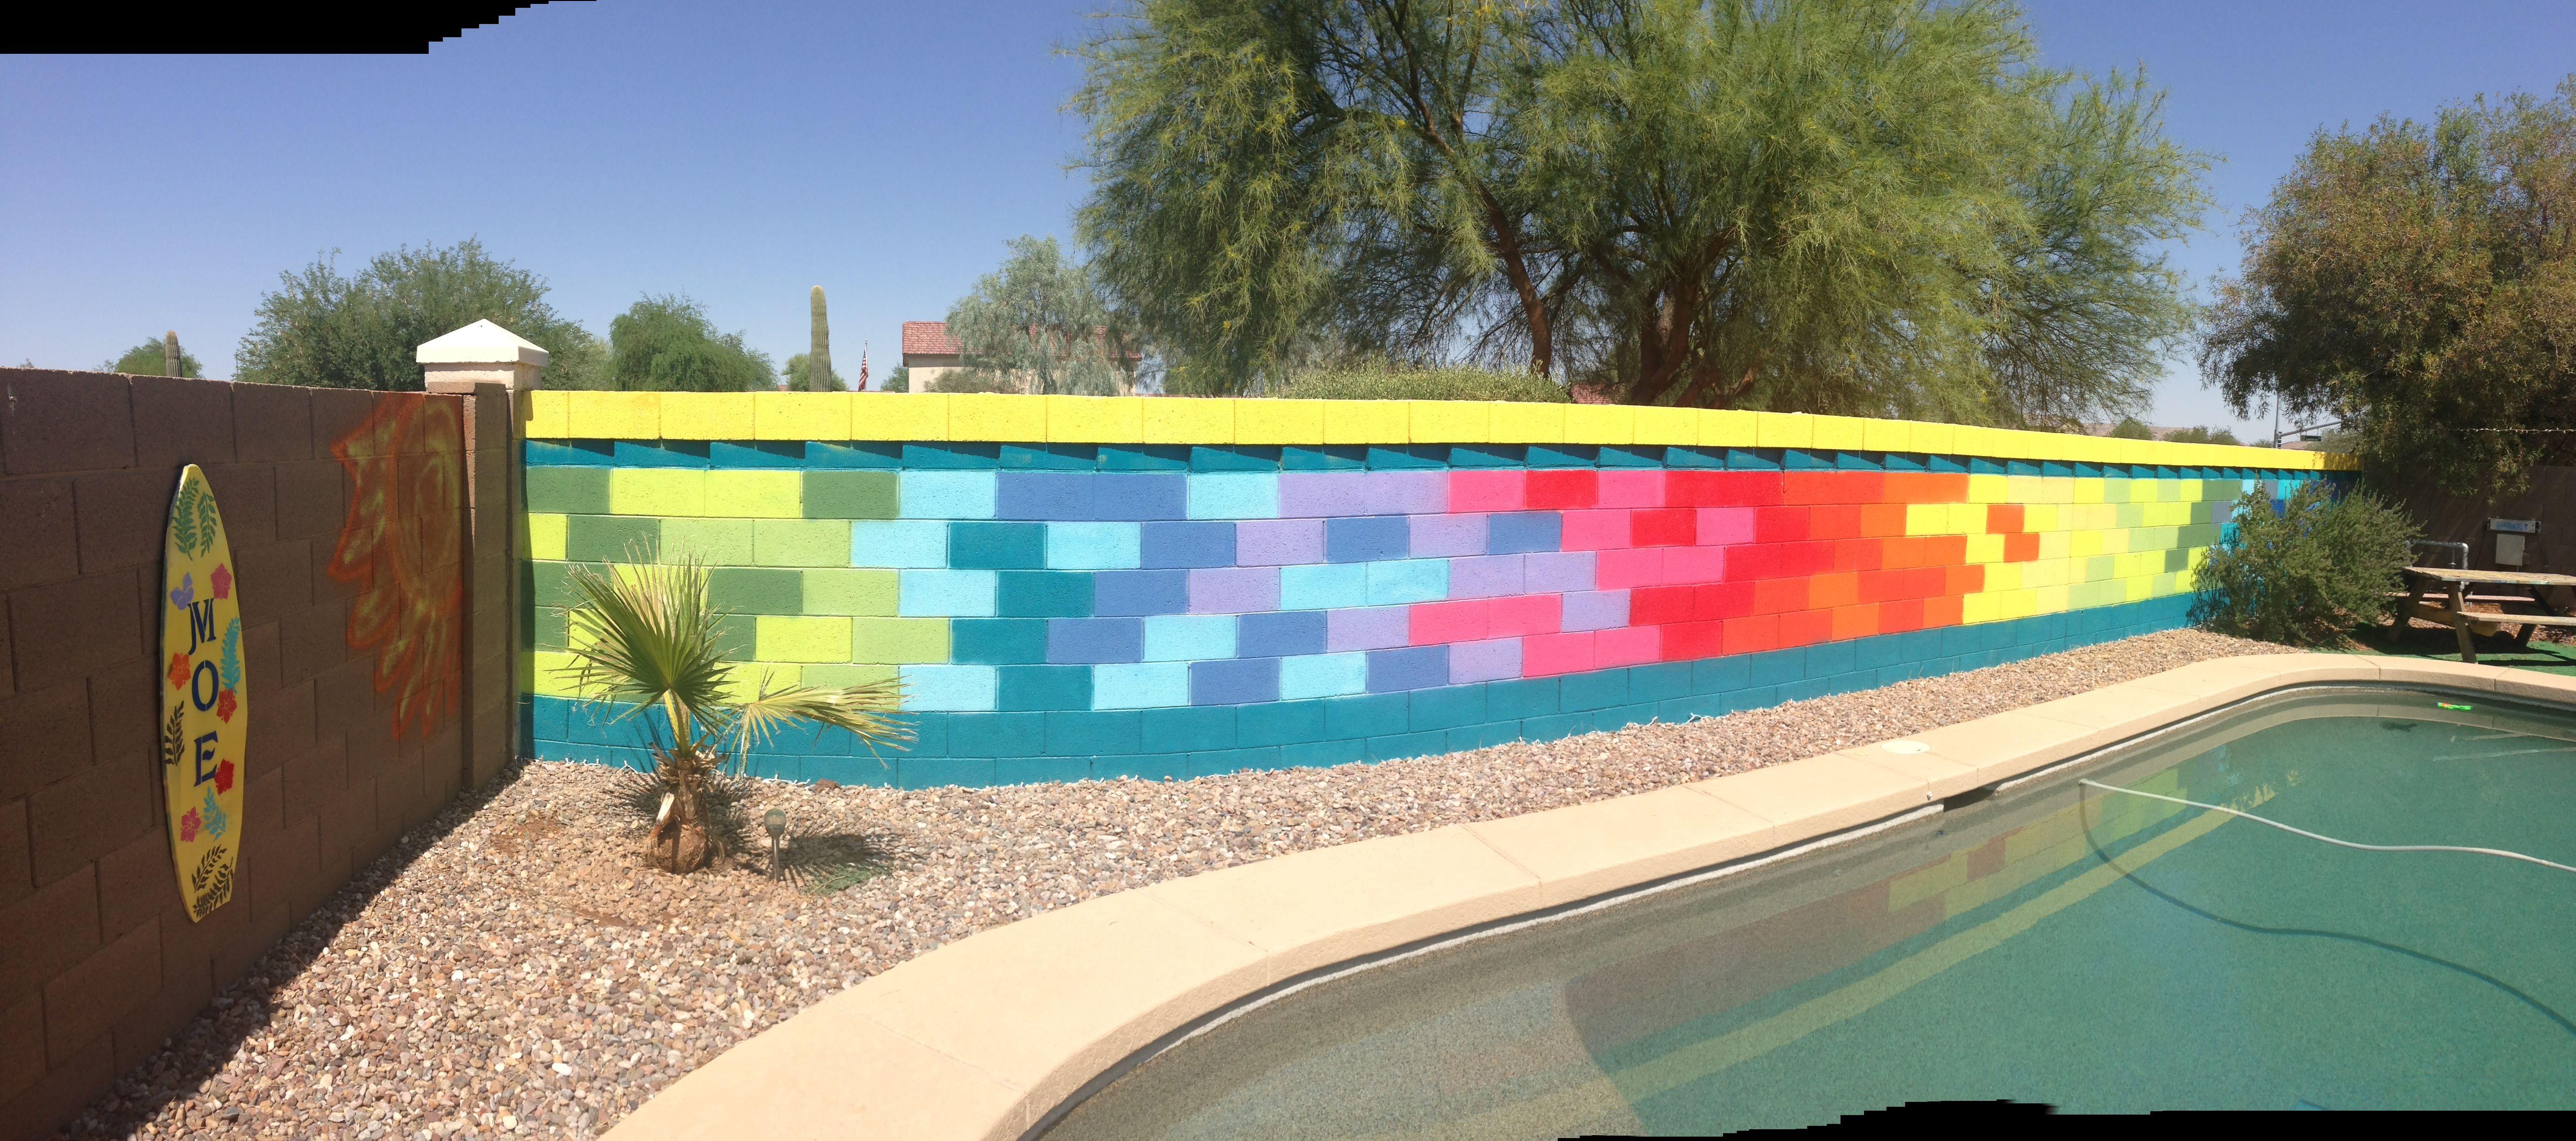 Spray Paint Brick Wall Brings Life To A Dull Brick Wall Next To